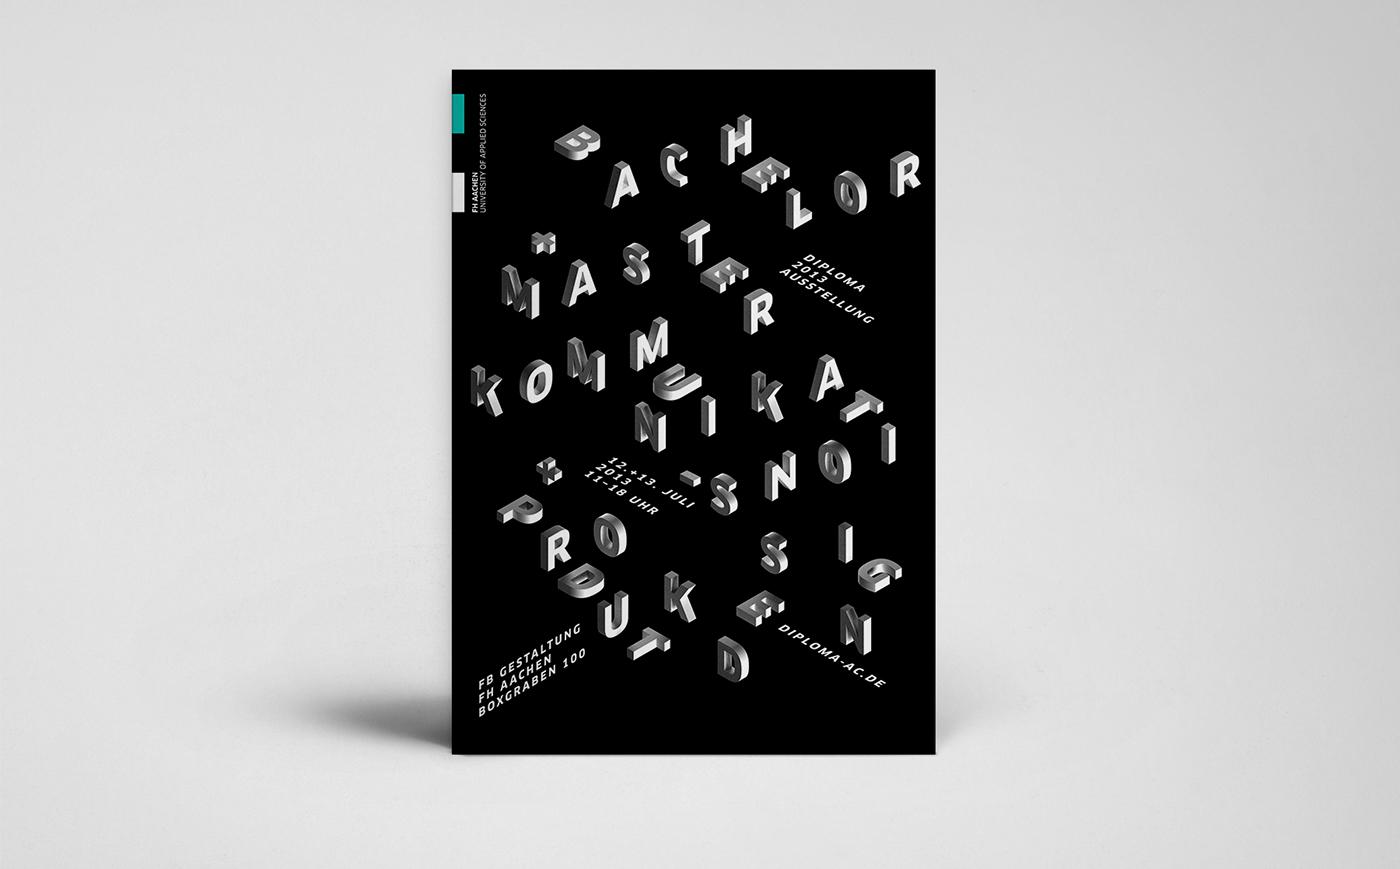 poster plakat Exhibition  Auststellung 3D